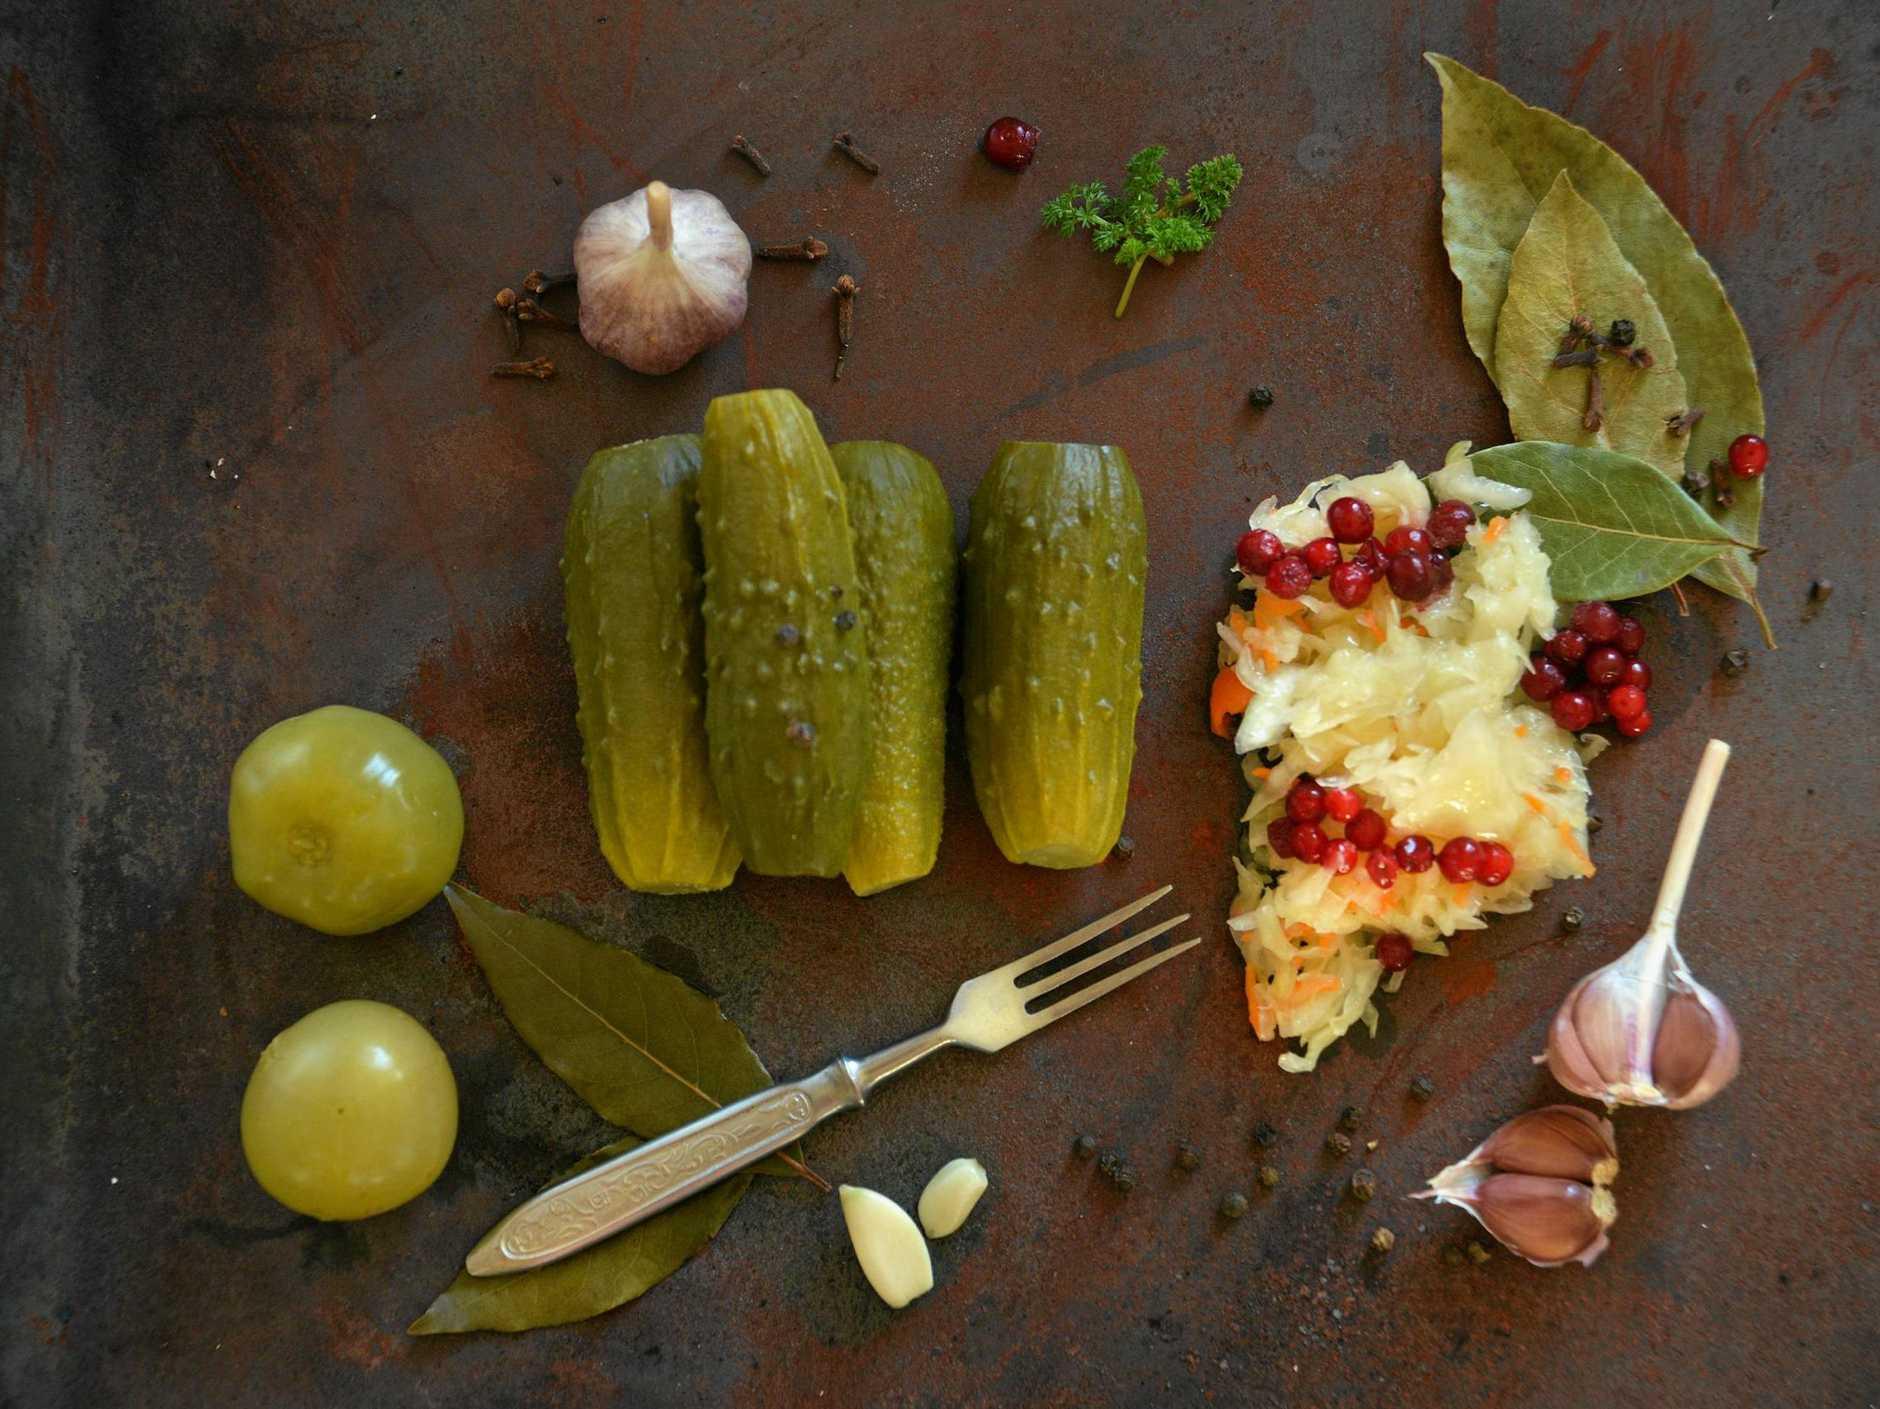 sauerkraut, cucumber pickles and yogurt - popular probiotic fermented food - three measuring cups against rustic wood